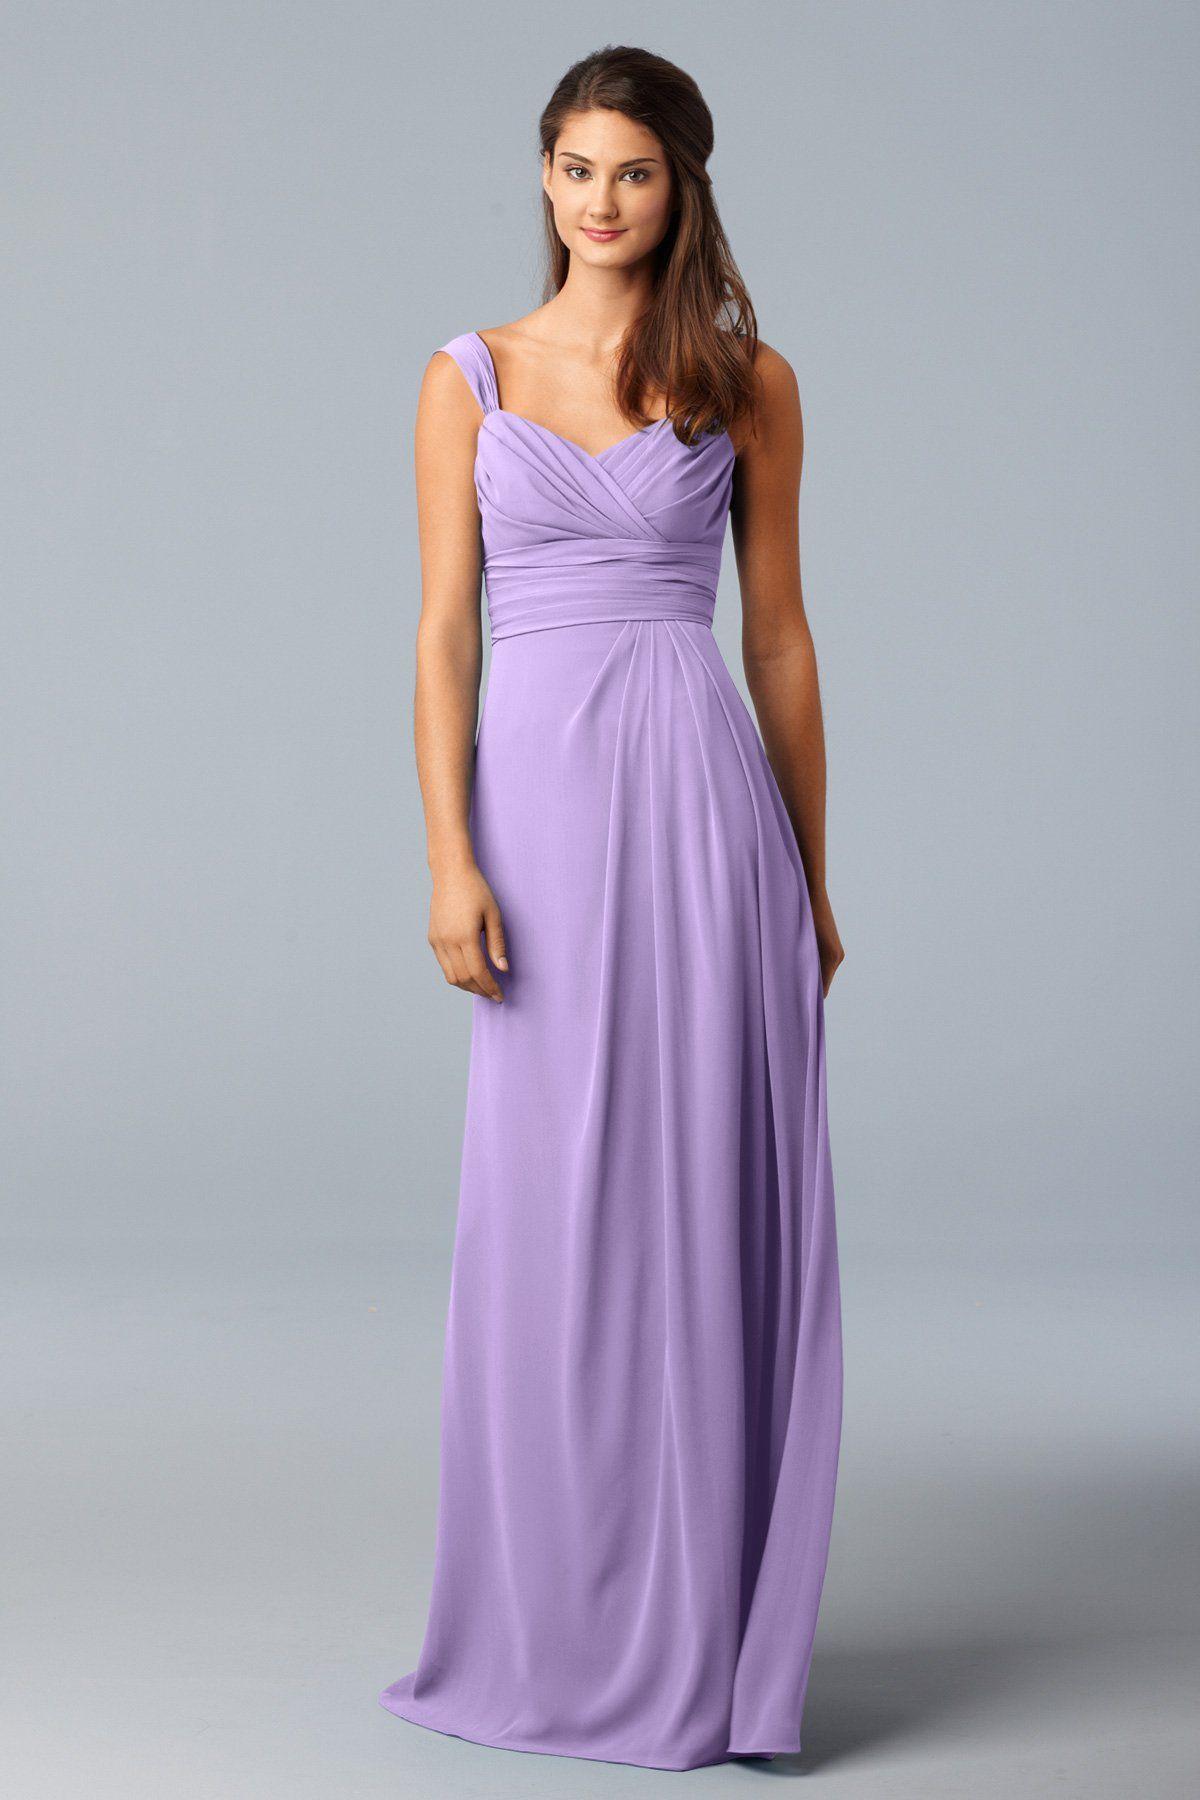 Pin by Gretchen Schmoll on Bridesmaids dresses | Pinterest | Wedding